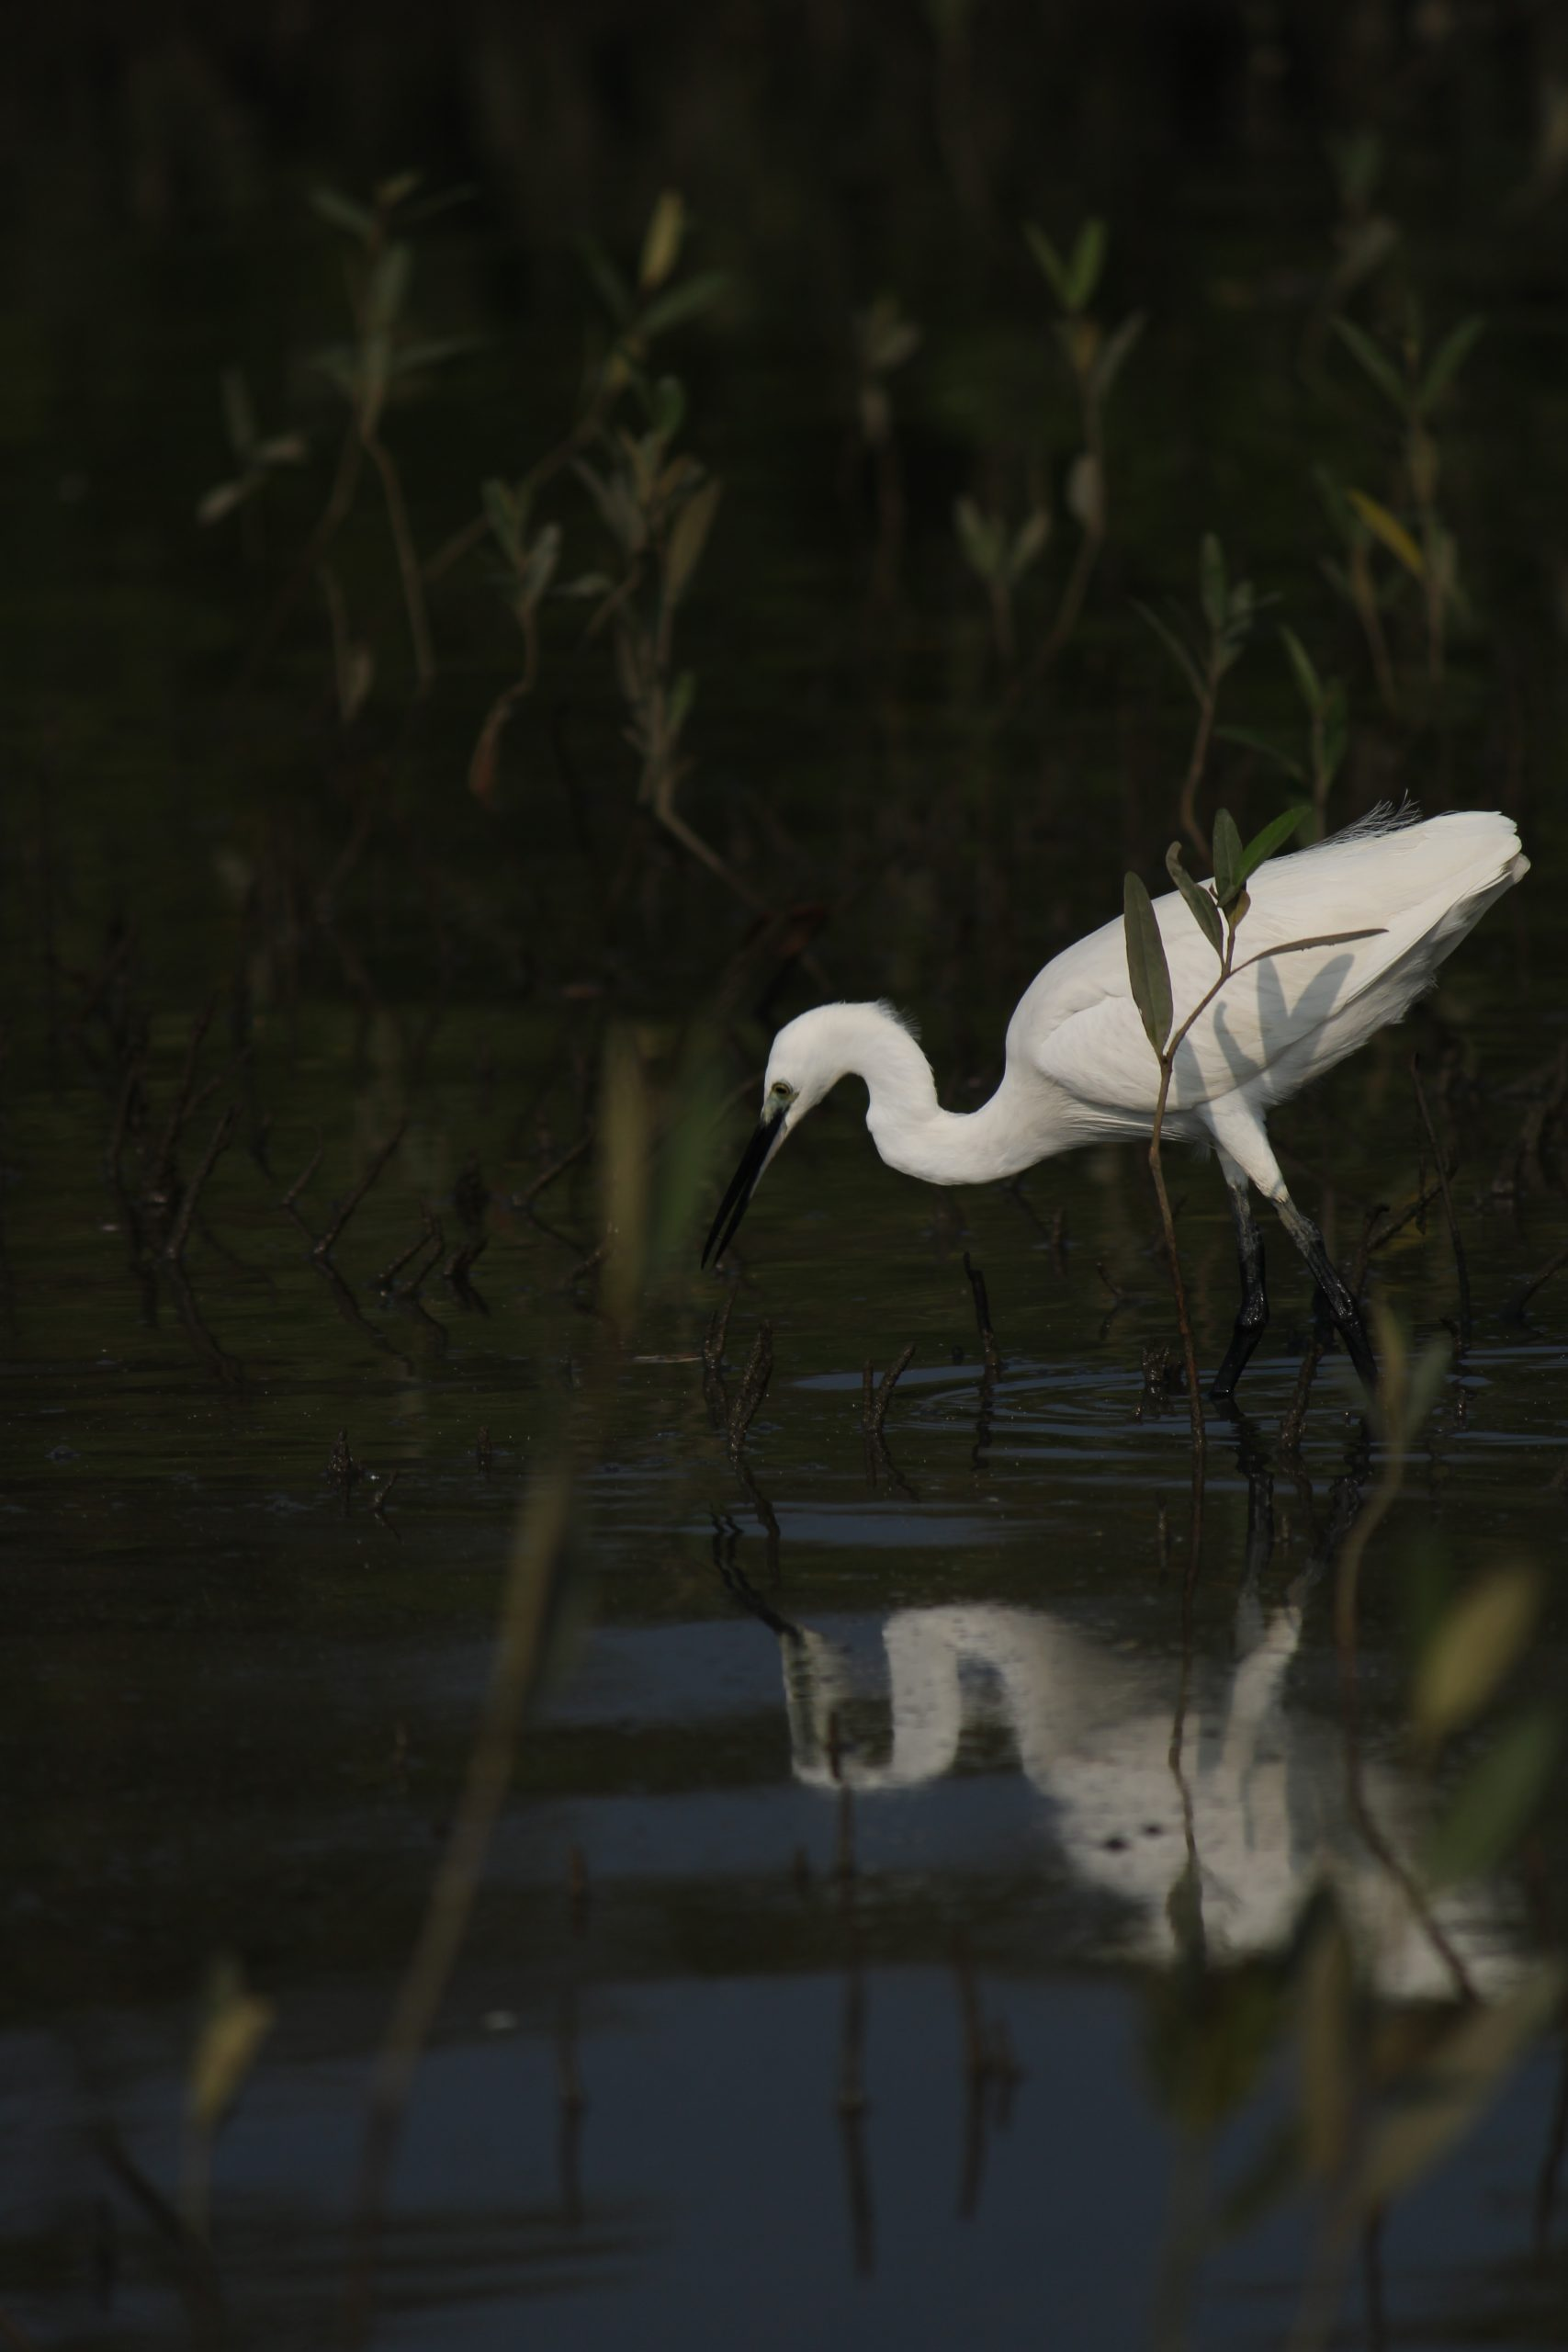 A crane bird in a pond